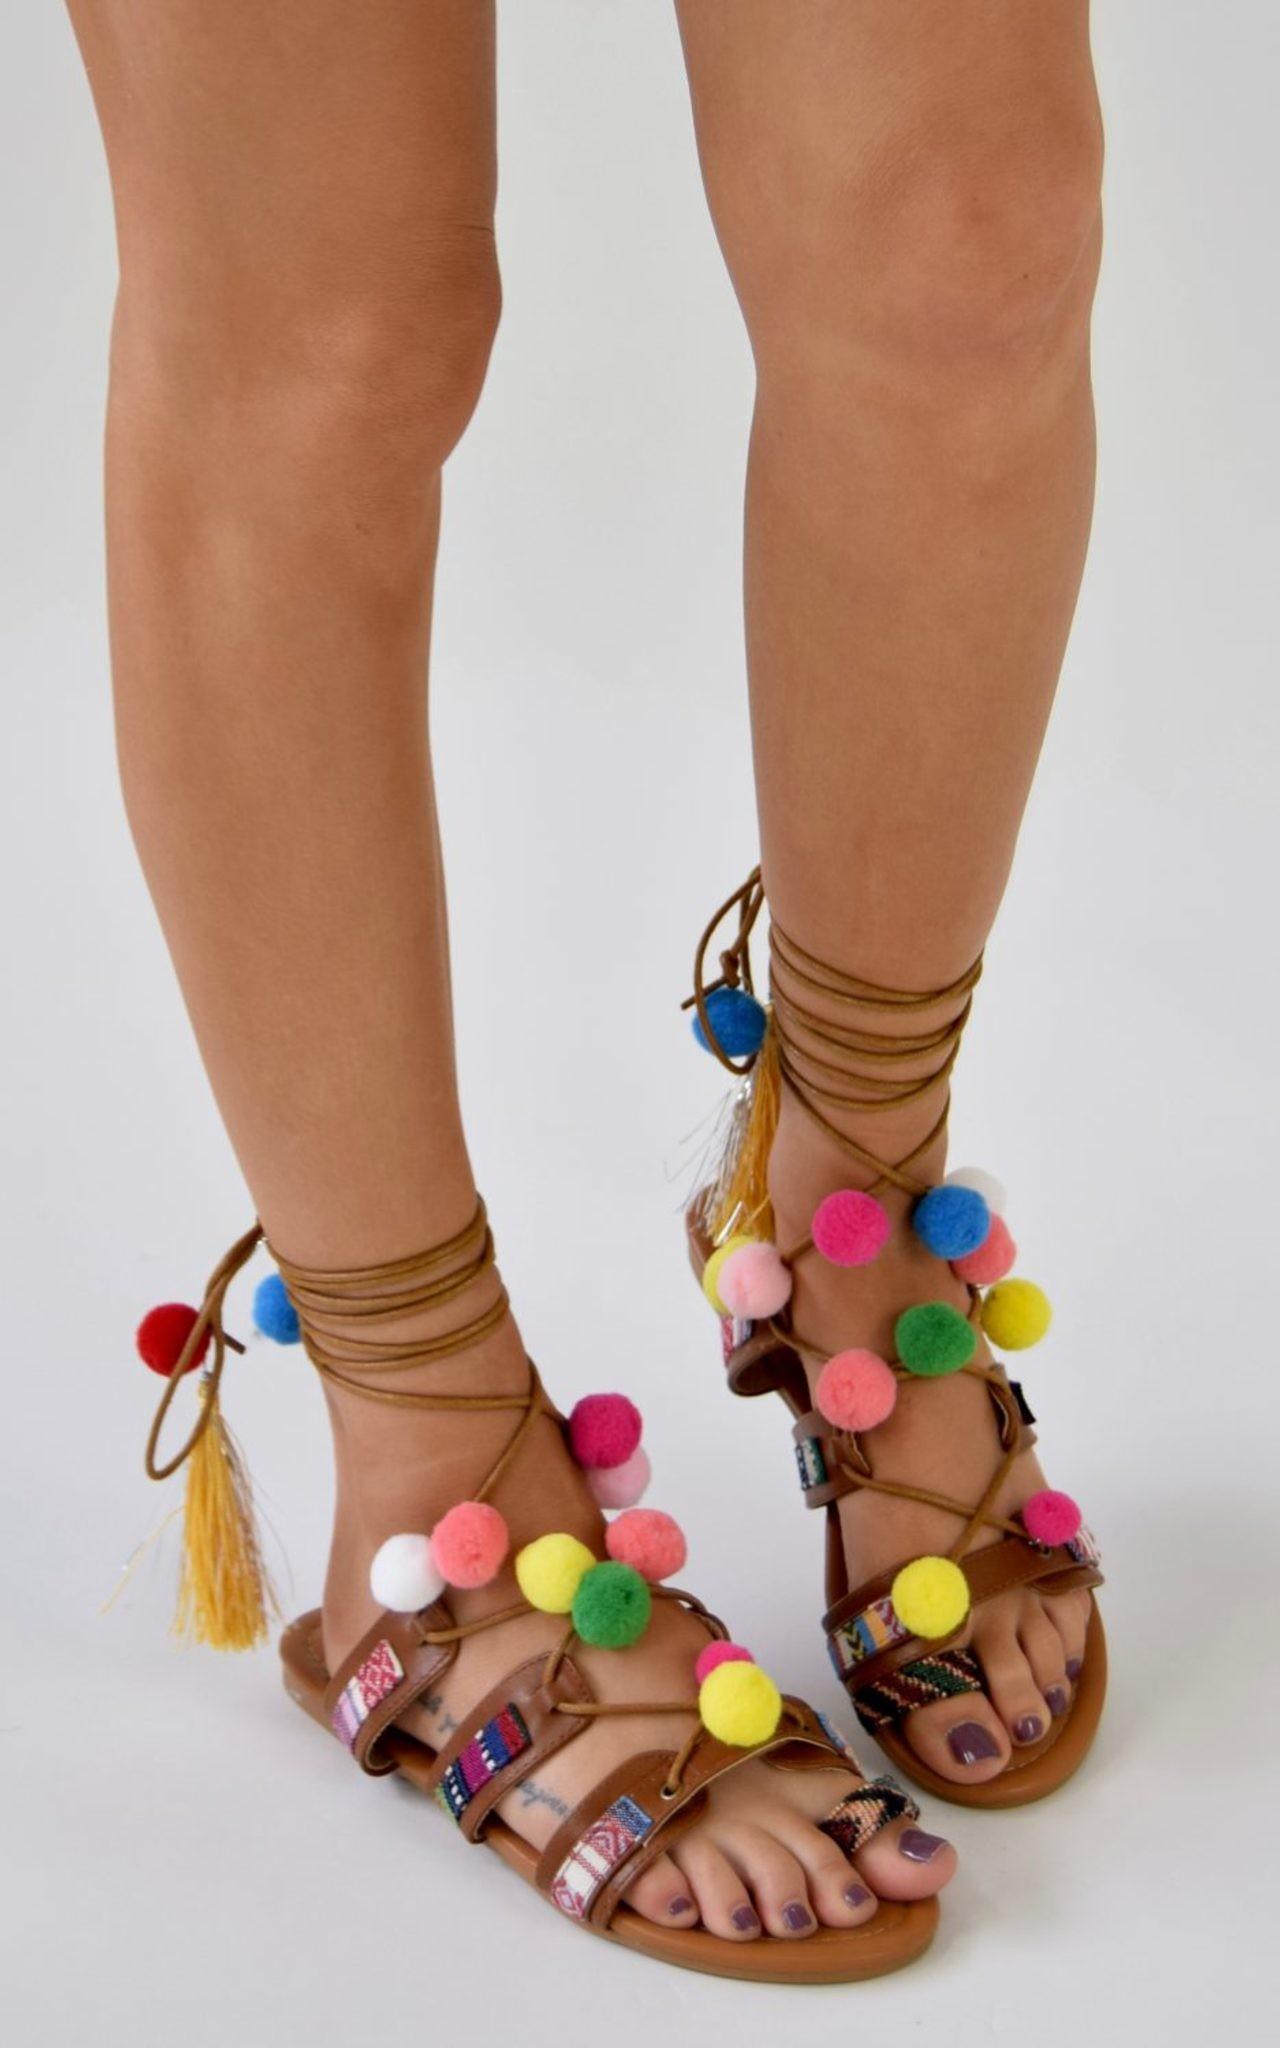 xlarge_BOHO_GIRL_Lace_Up_Pom_Pom_Sandals_-_Camel_-_AJ_Voyage_-_2